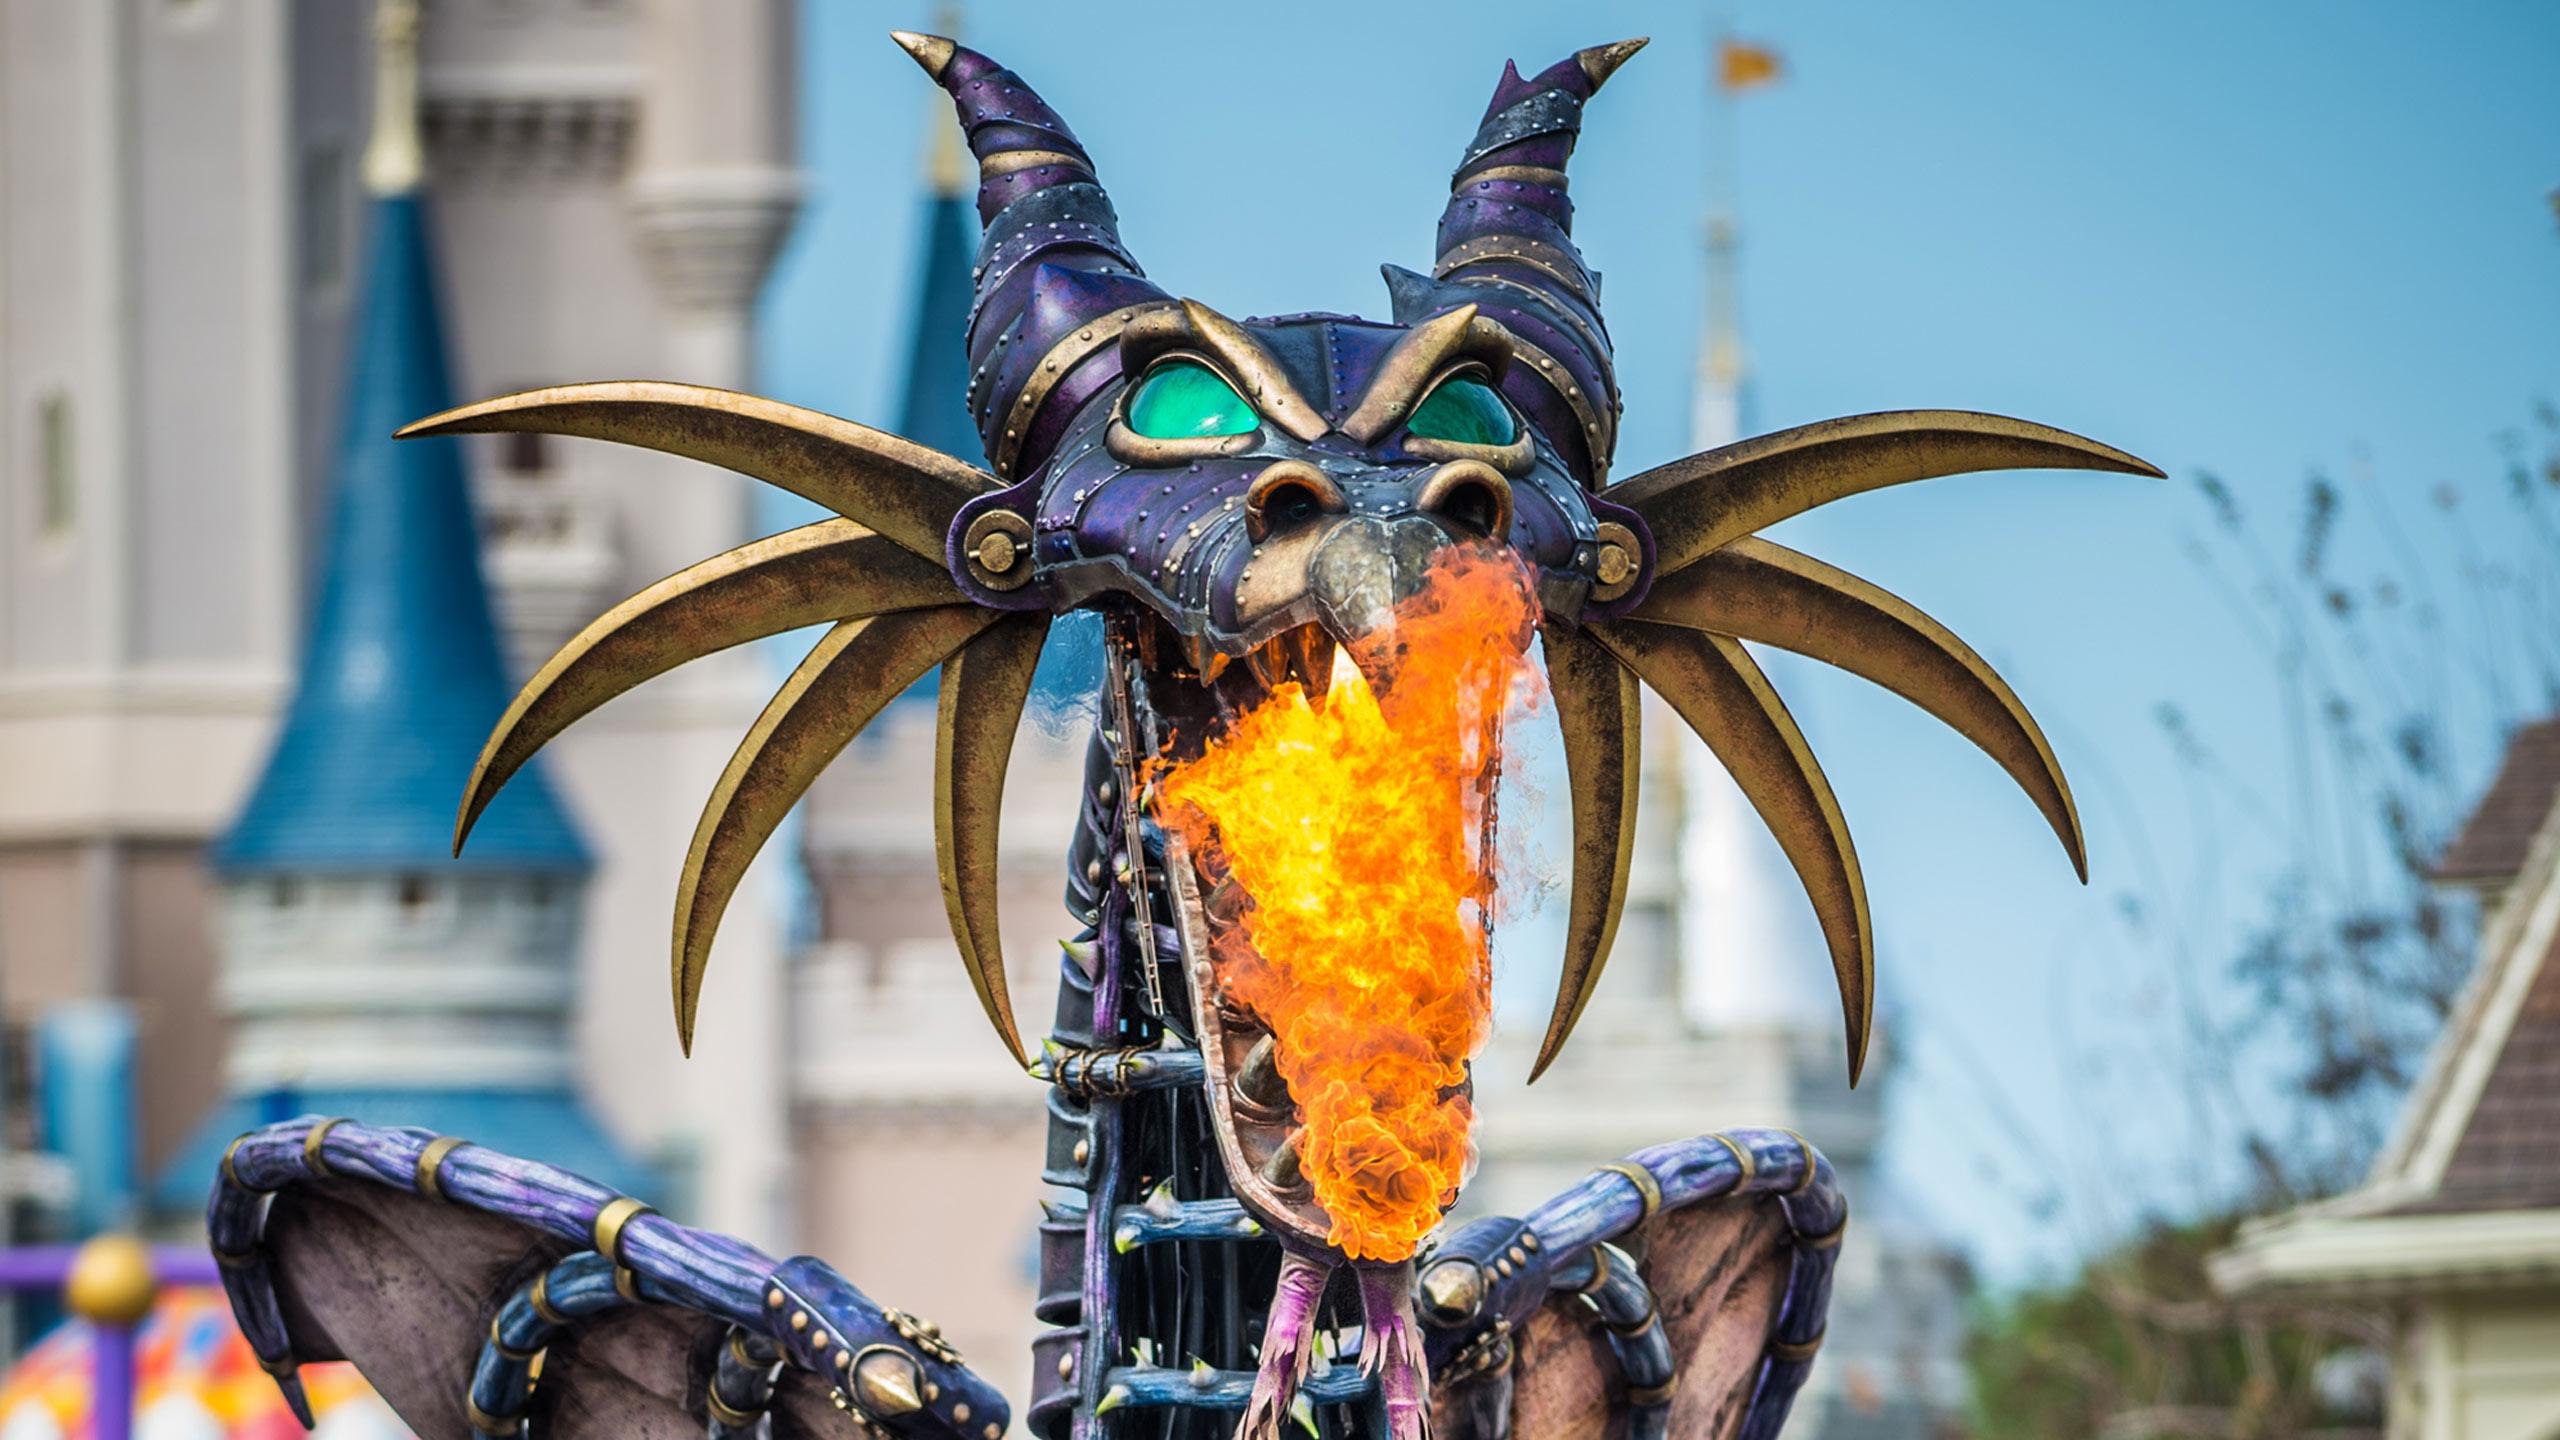 16-9_hd00000_2017aug31_festival-of-fantasy-parade-dragon.jpg